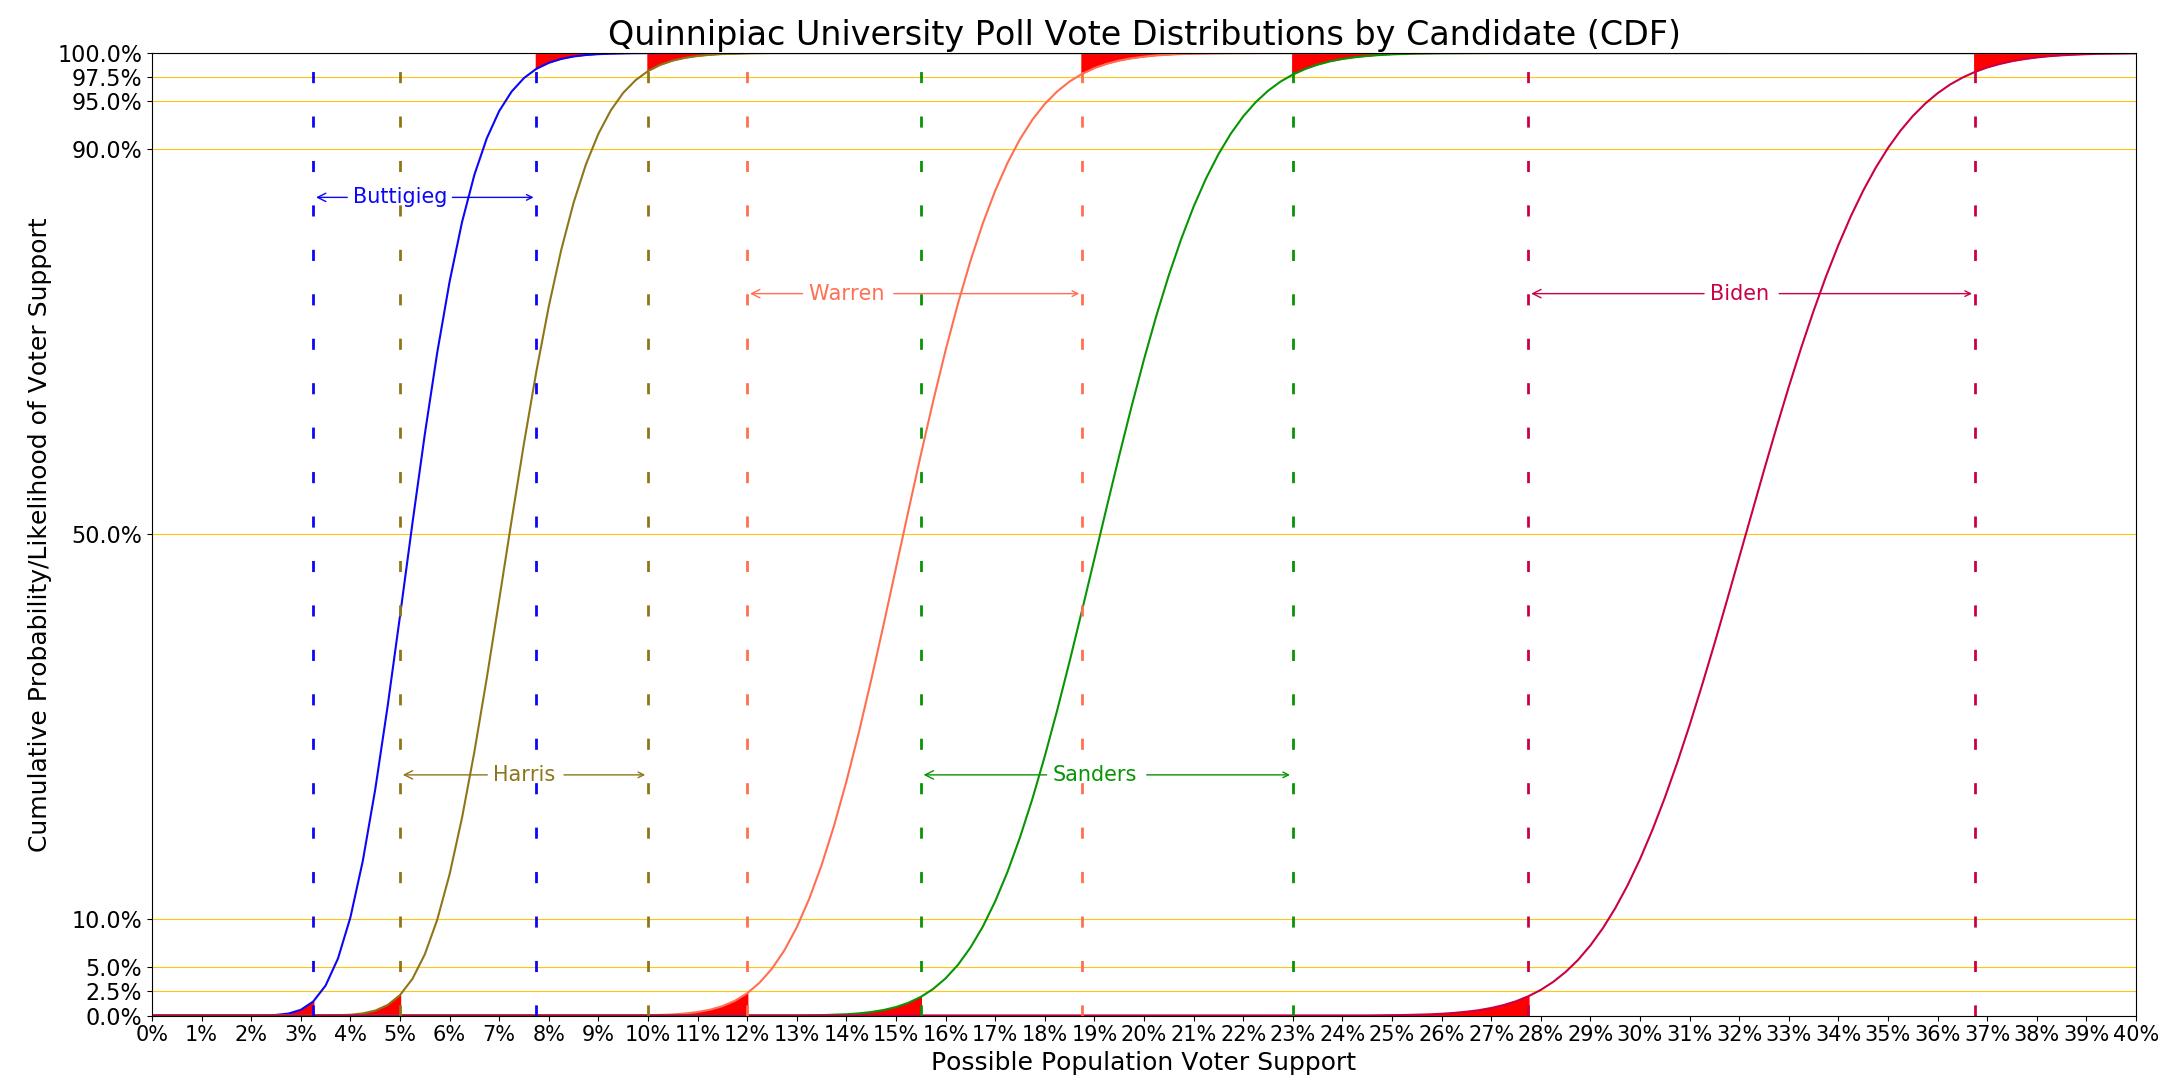 Quinnipiac distributions graph with DE